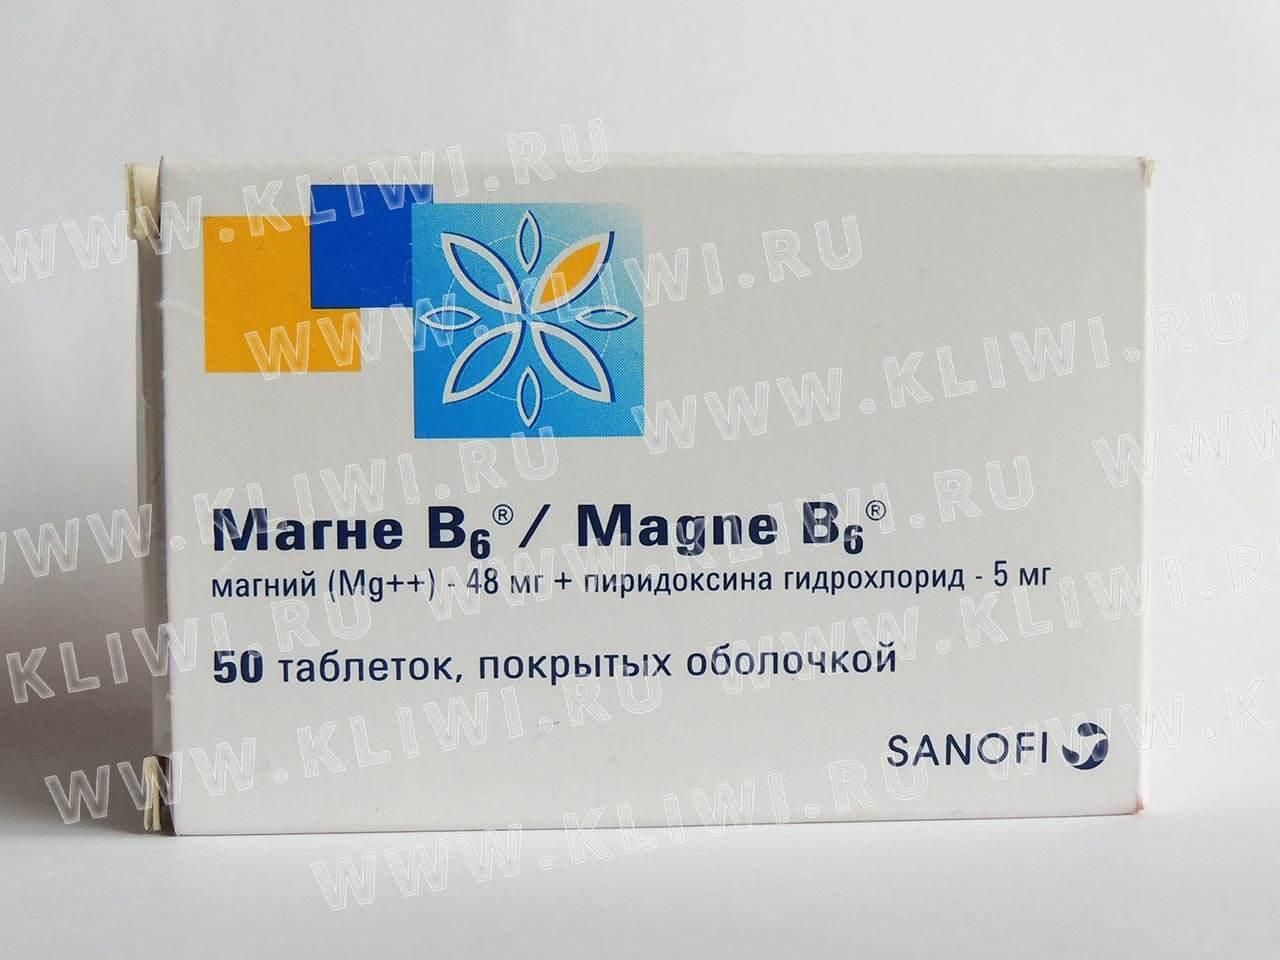 magnis plius nuo hipertenzijos)